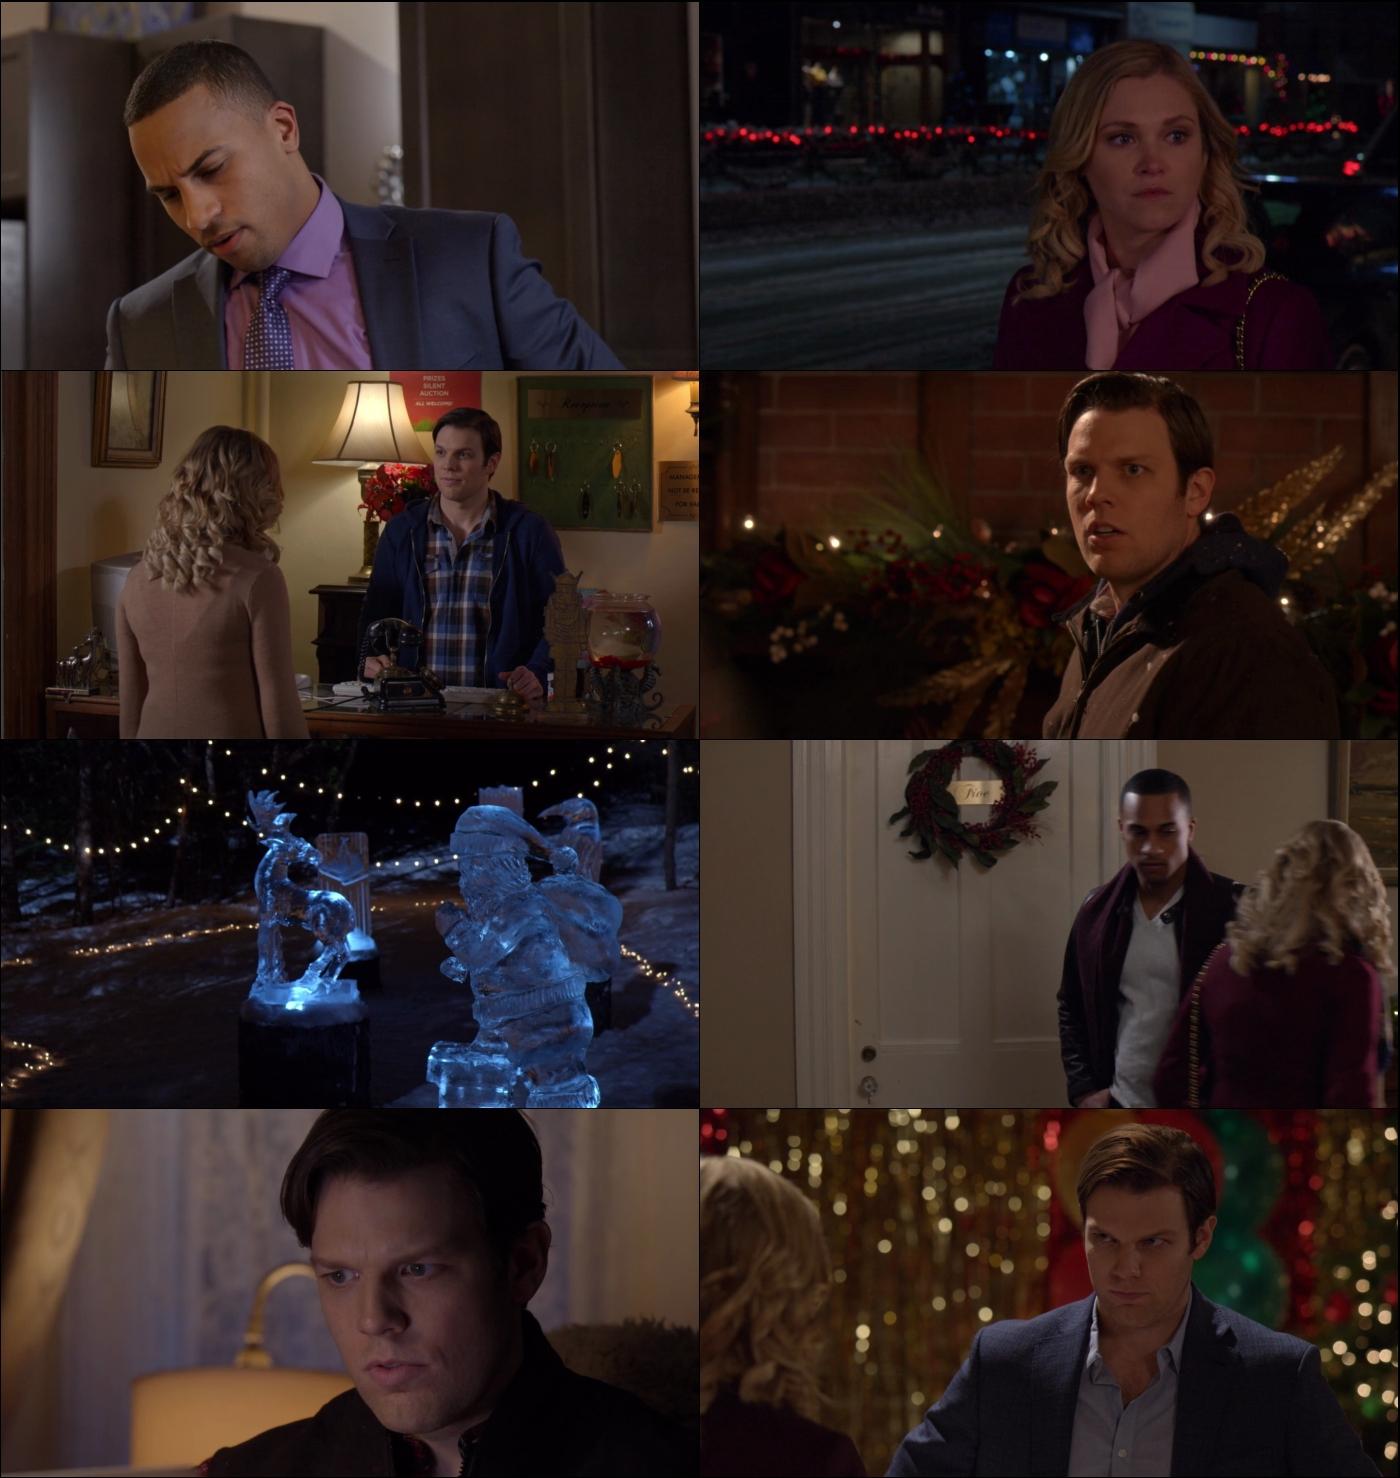 Tarjeta de Navidad 1080p